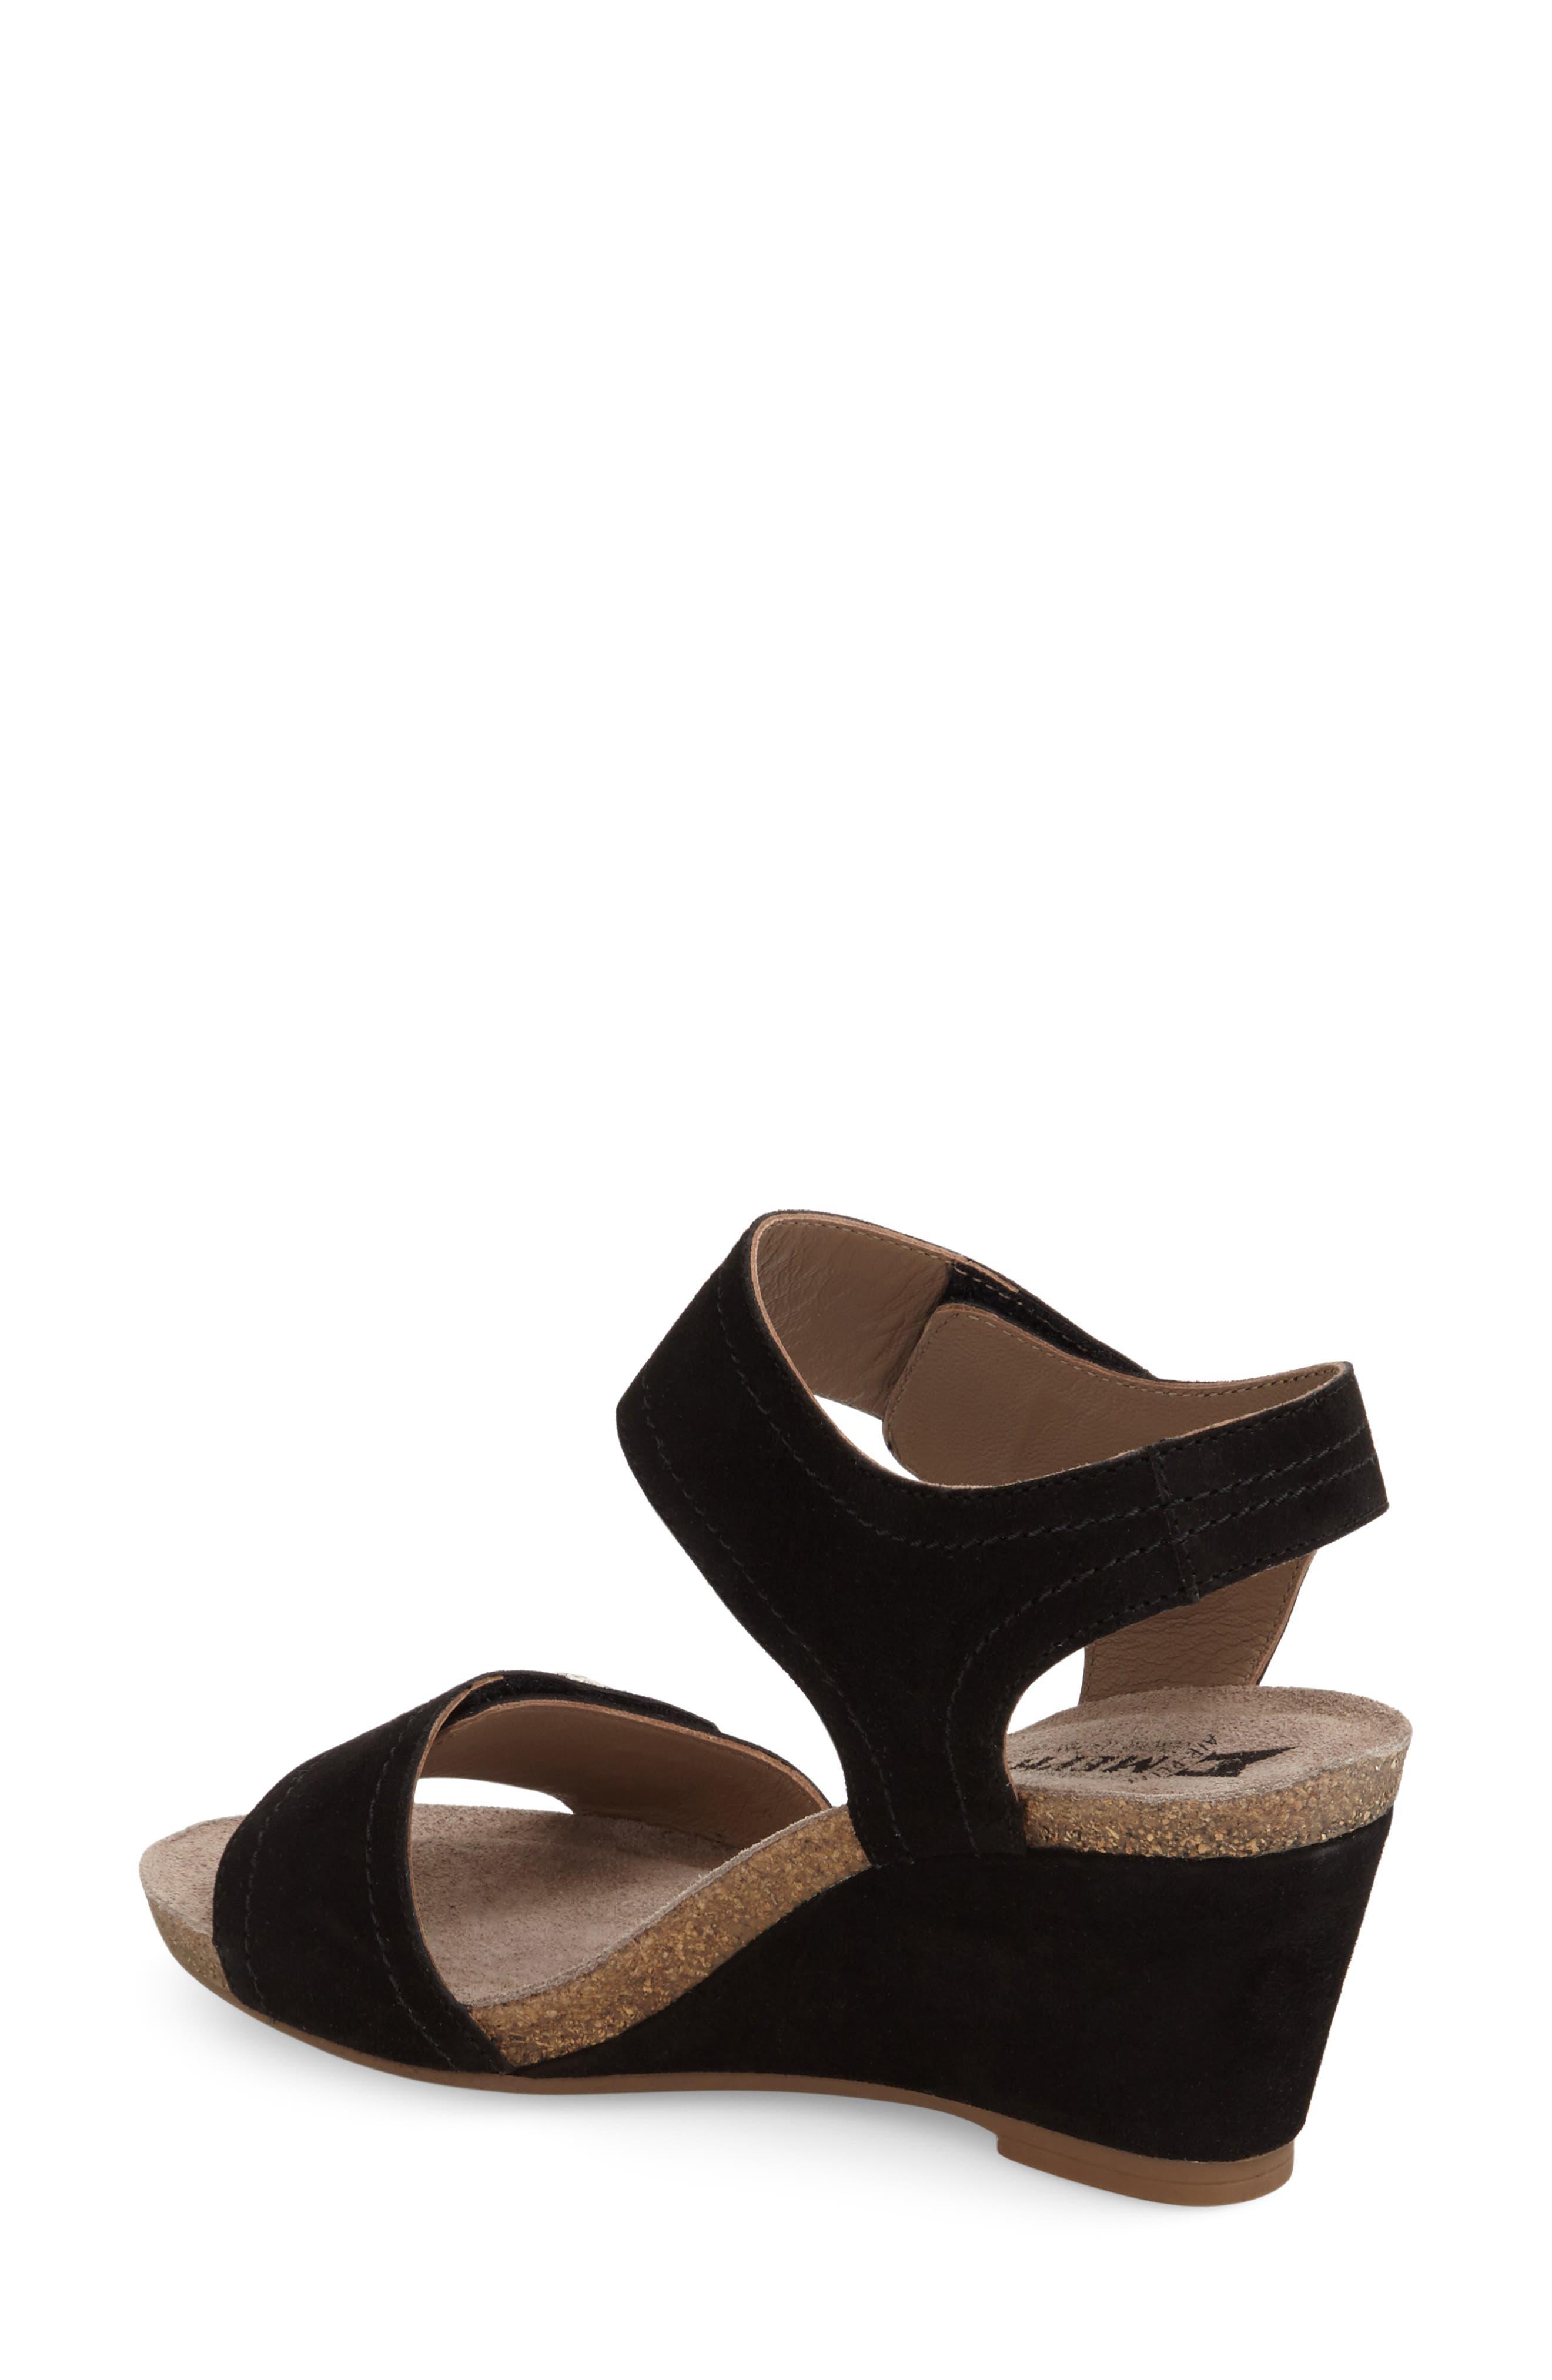 'Jackie' Wedge Sandal,                             Alternate thumbnail 4, color,                             BLACK PREMIUM SUEDE